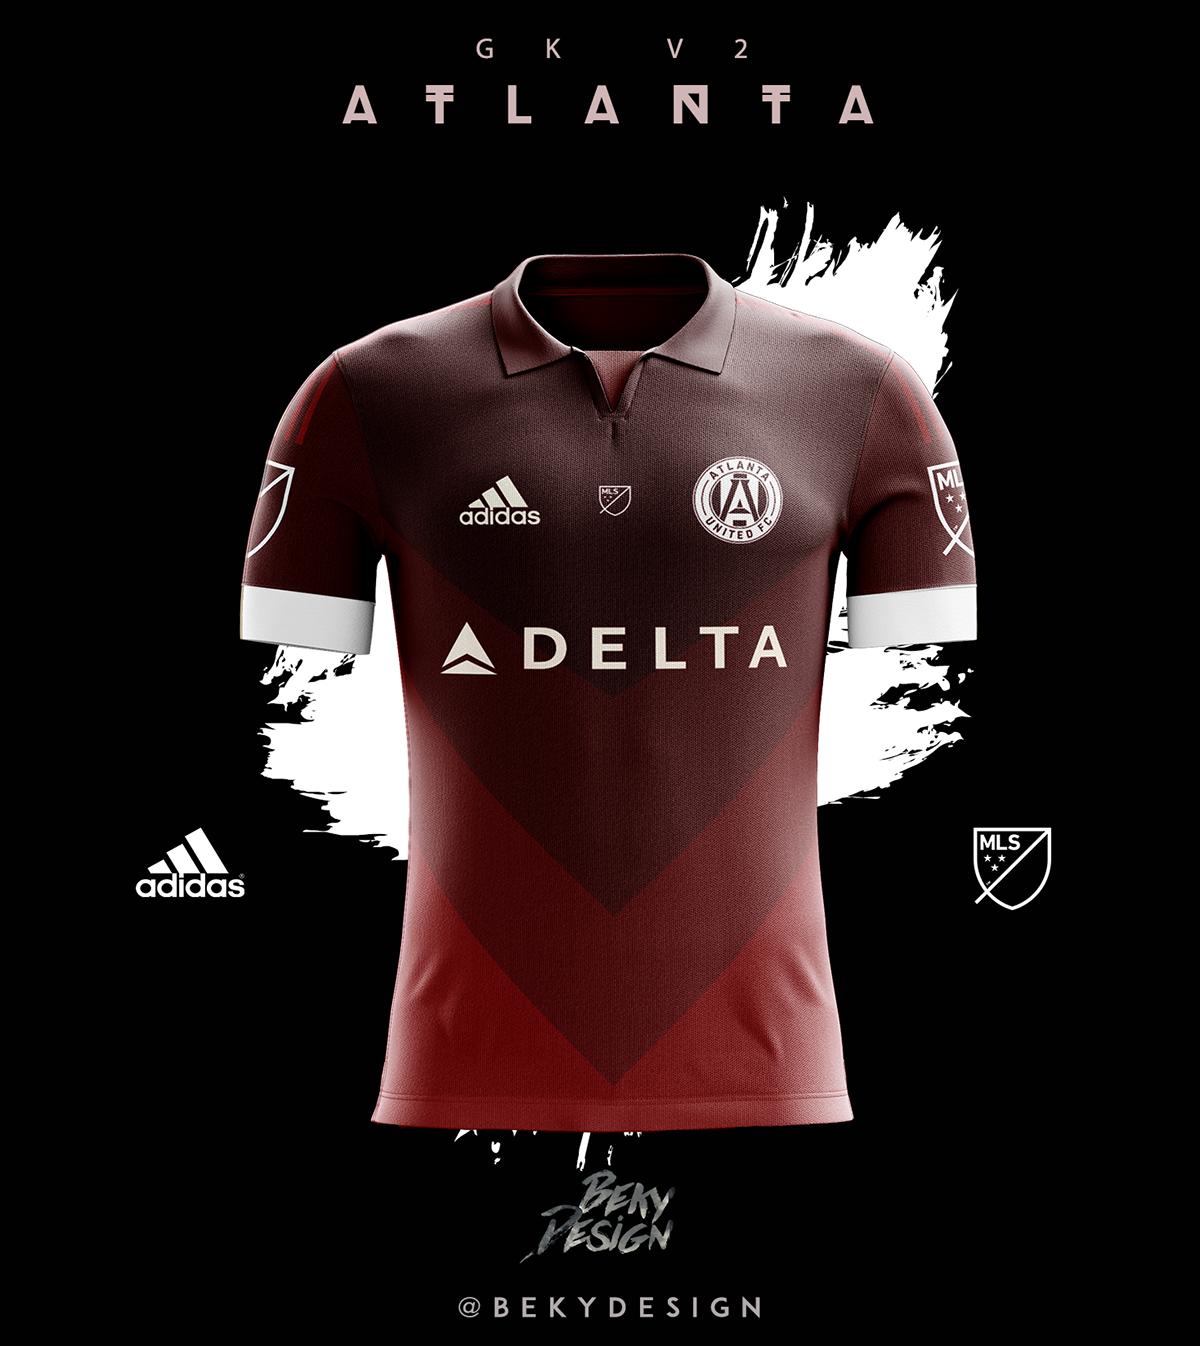 quality design e2081 59432 Atlanta United FC - Concepts on Behance